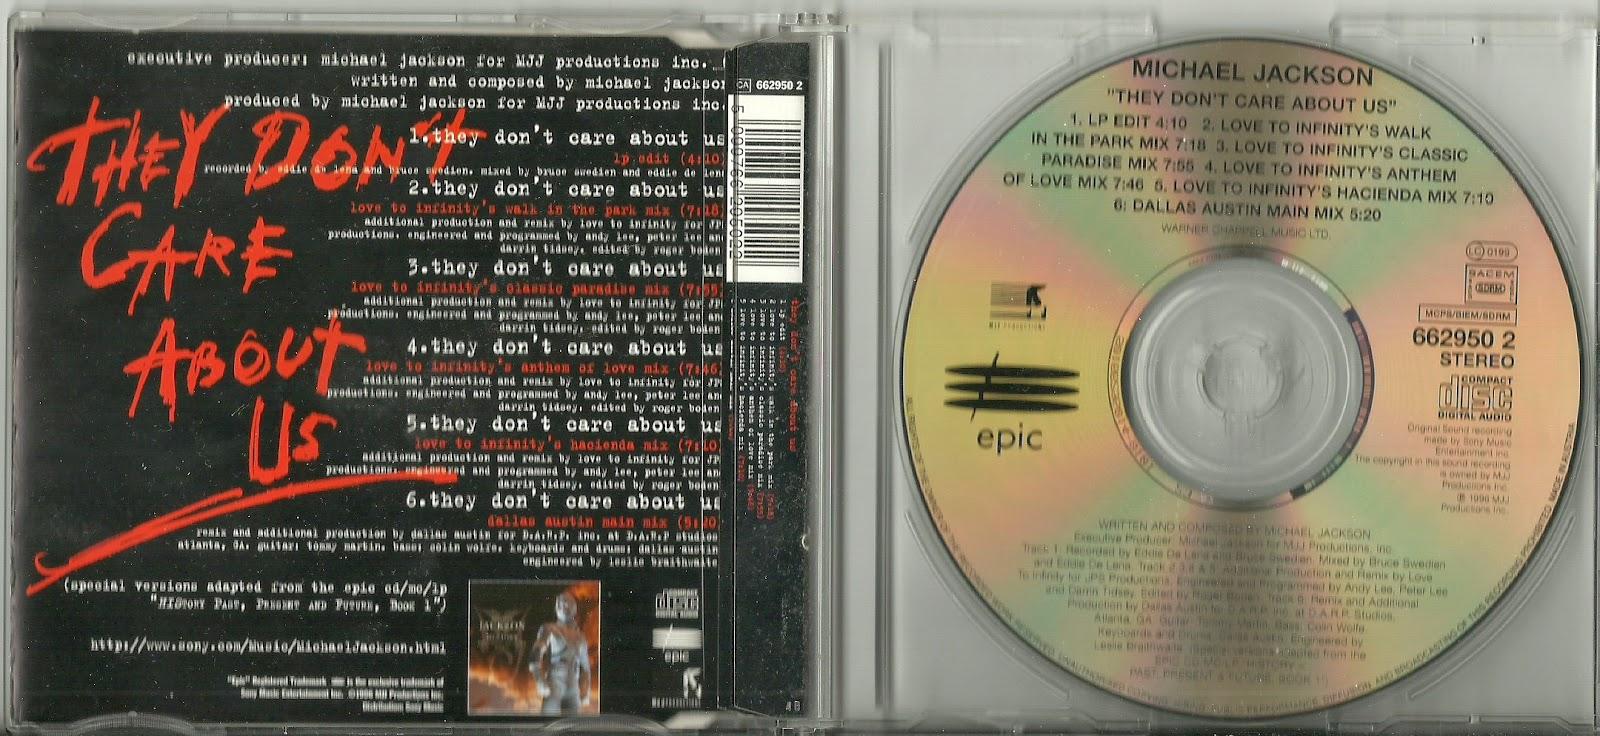 TDCAU Maxi CD